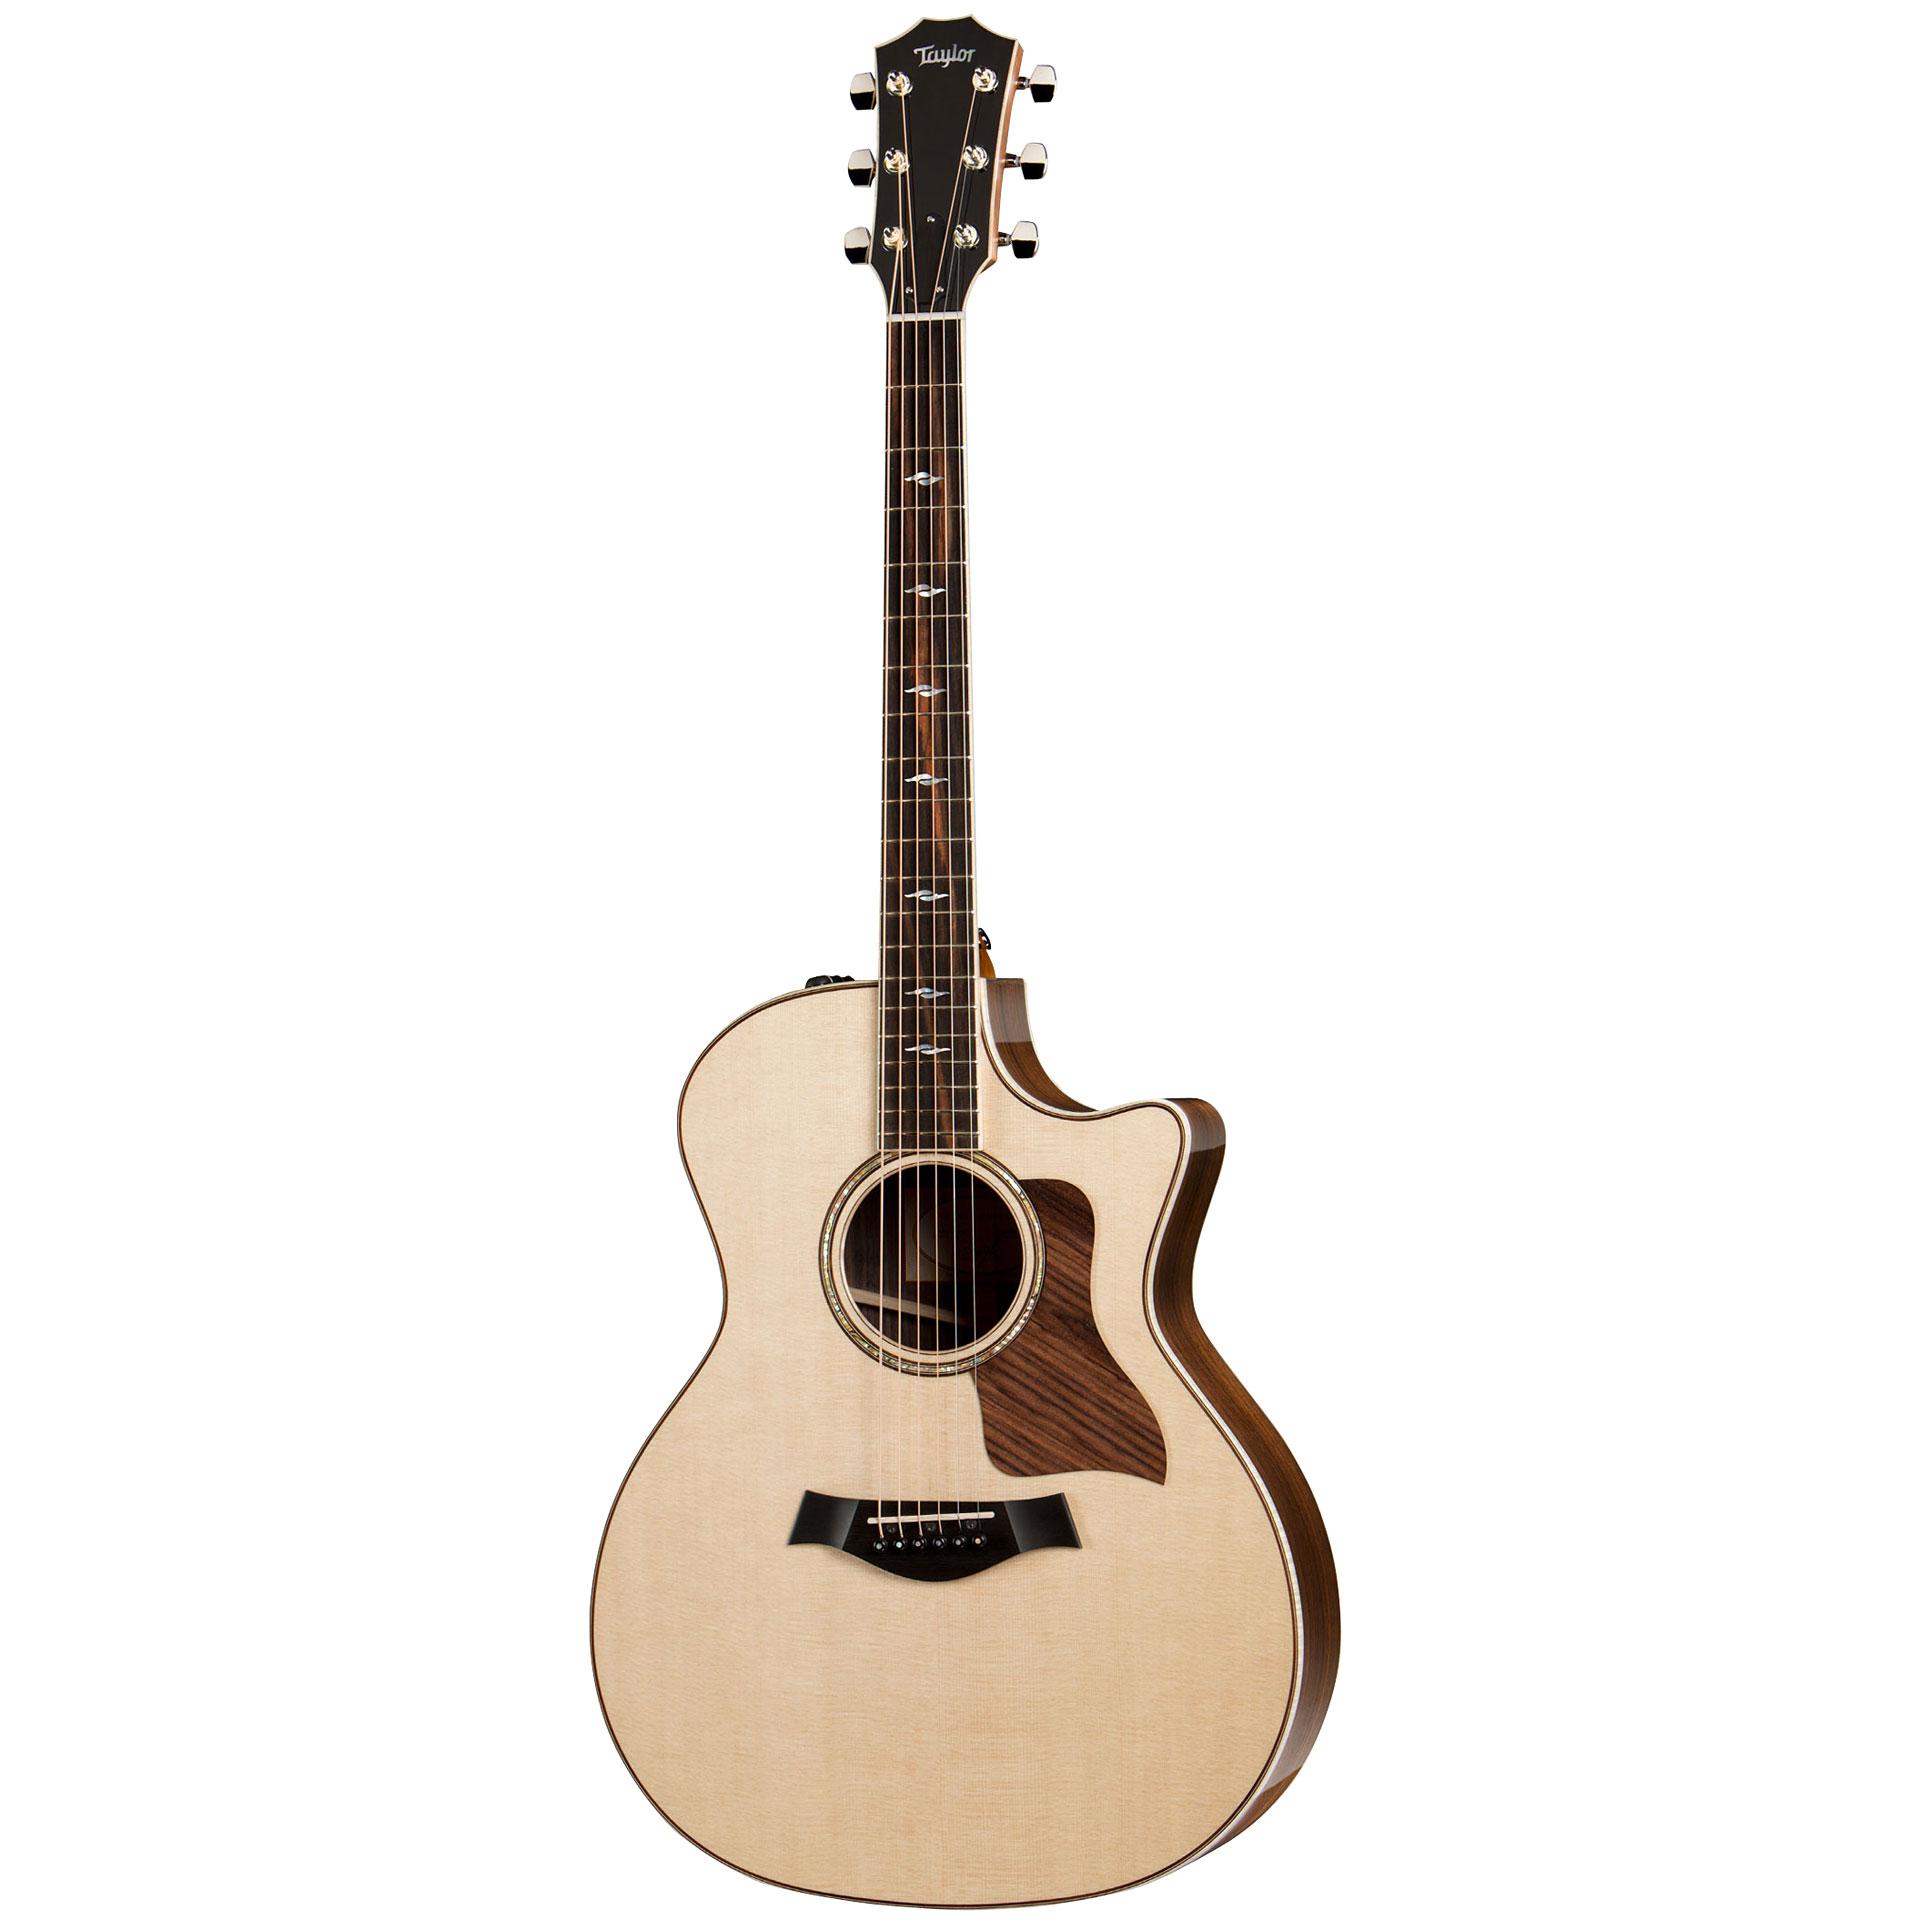 guitare acoustique moyenne gamme